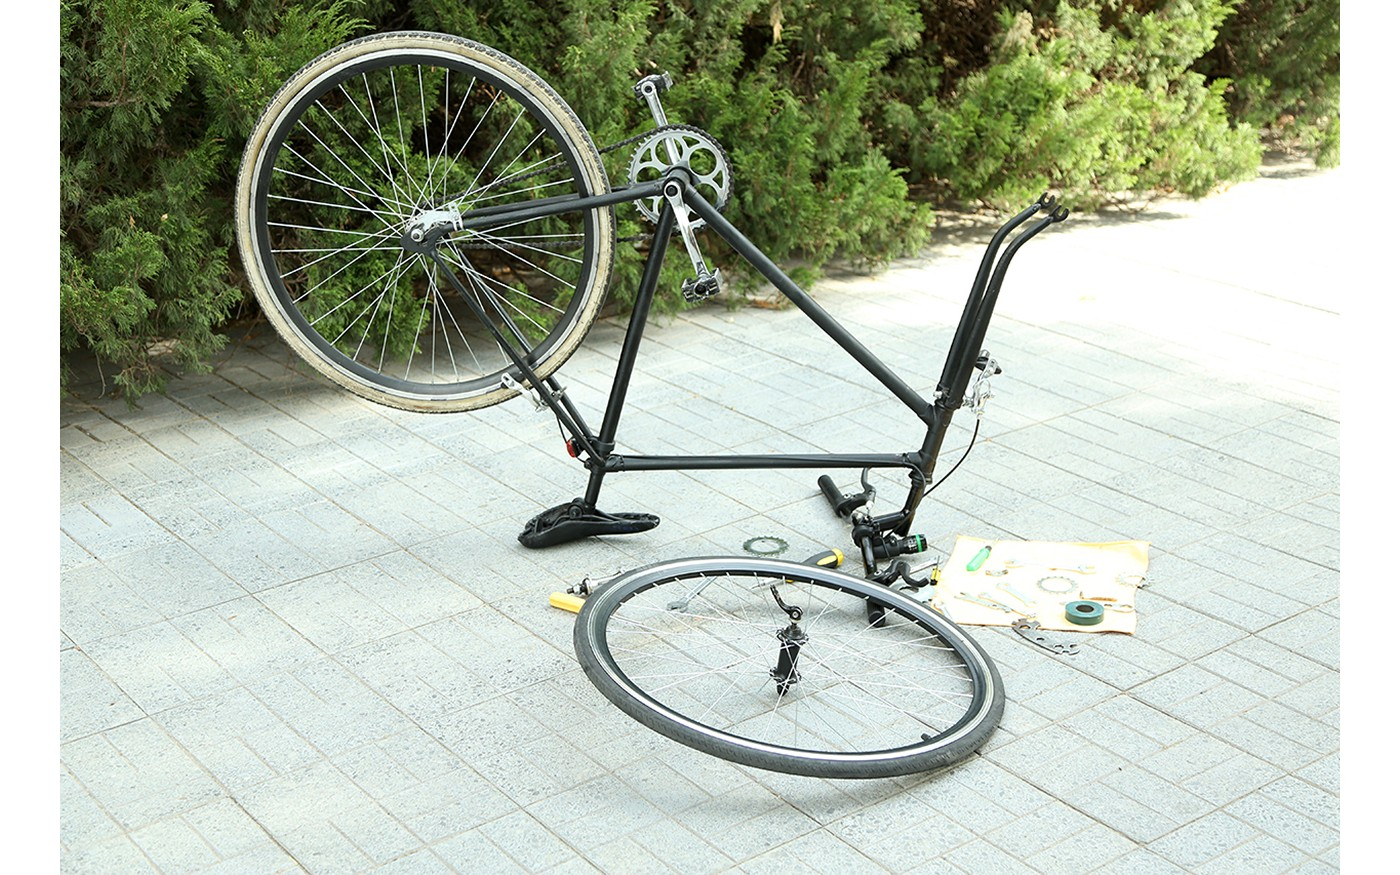 Kaputtes Fahrrad